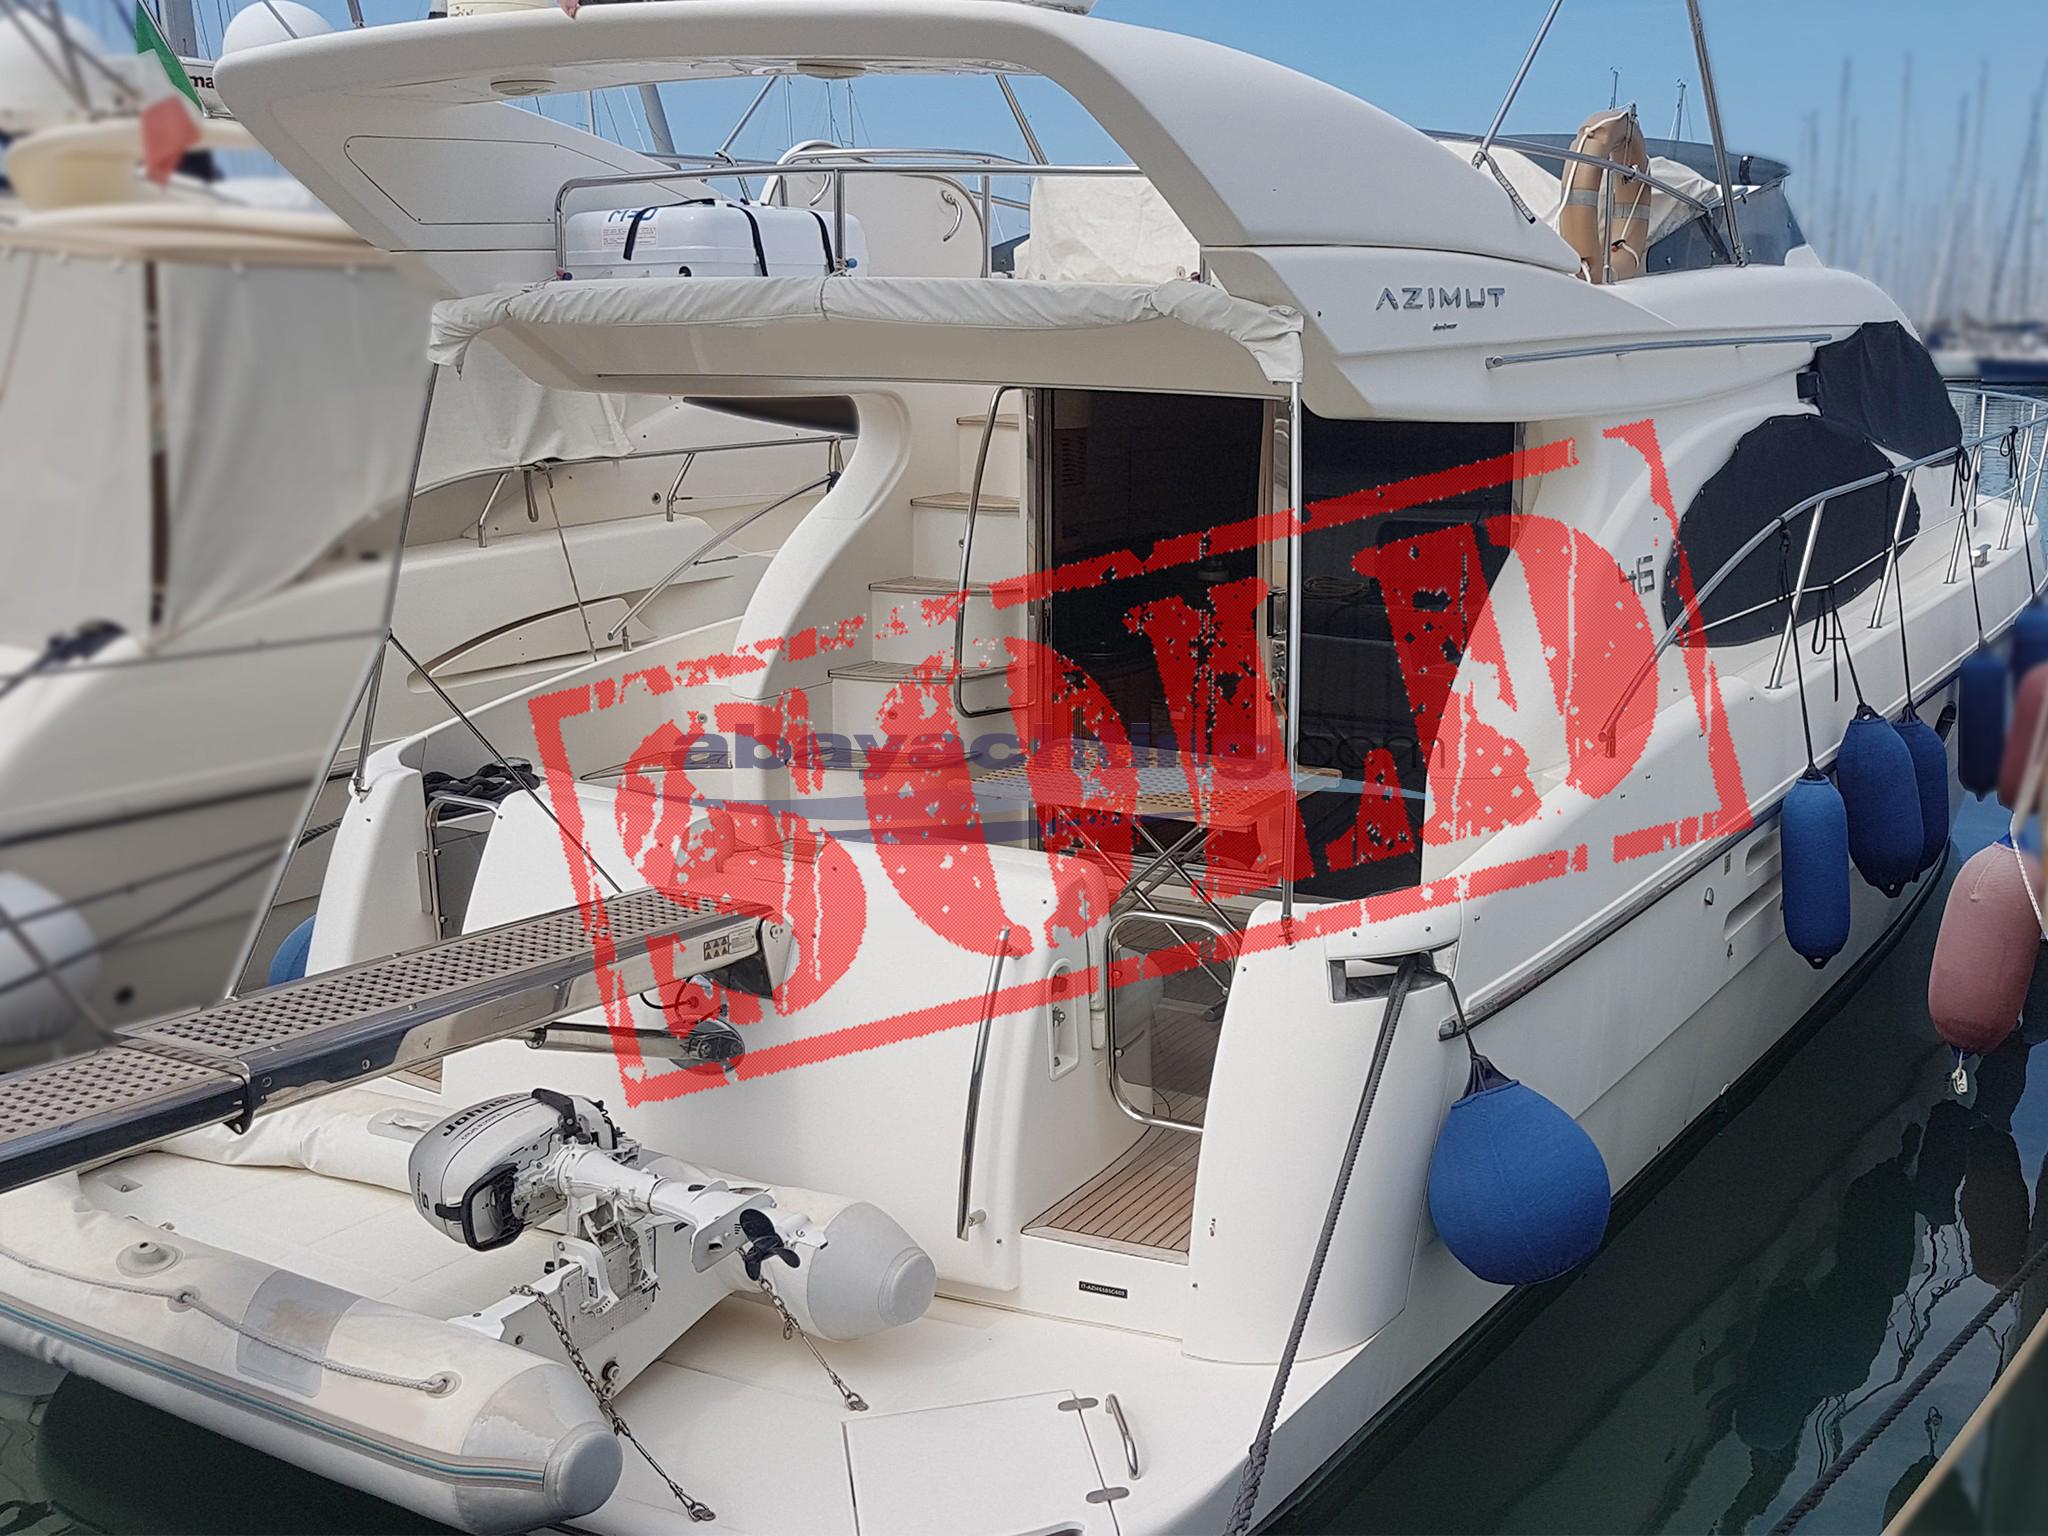 Azimut 46 sold